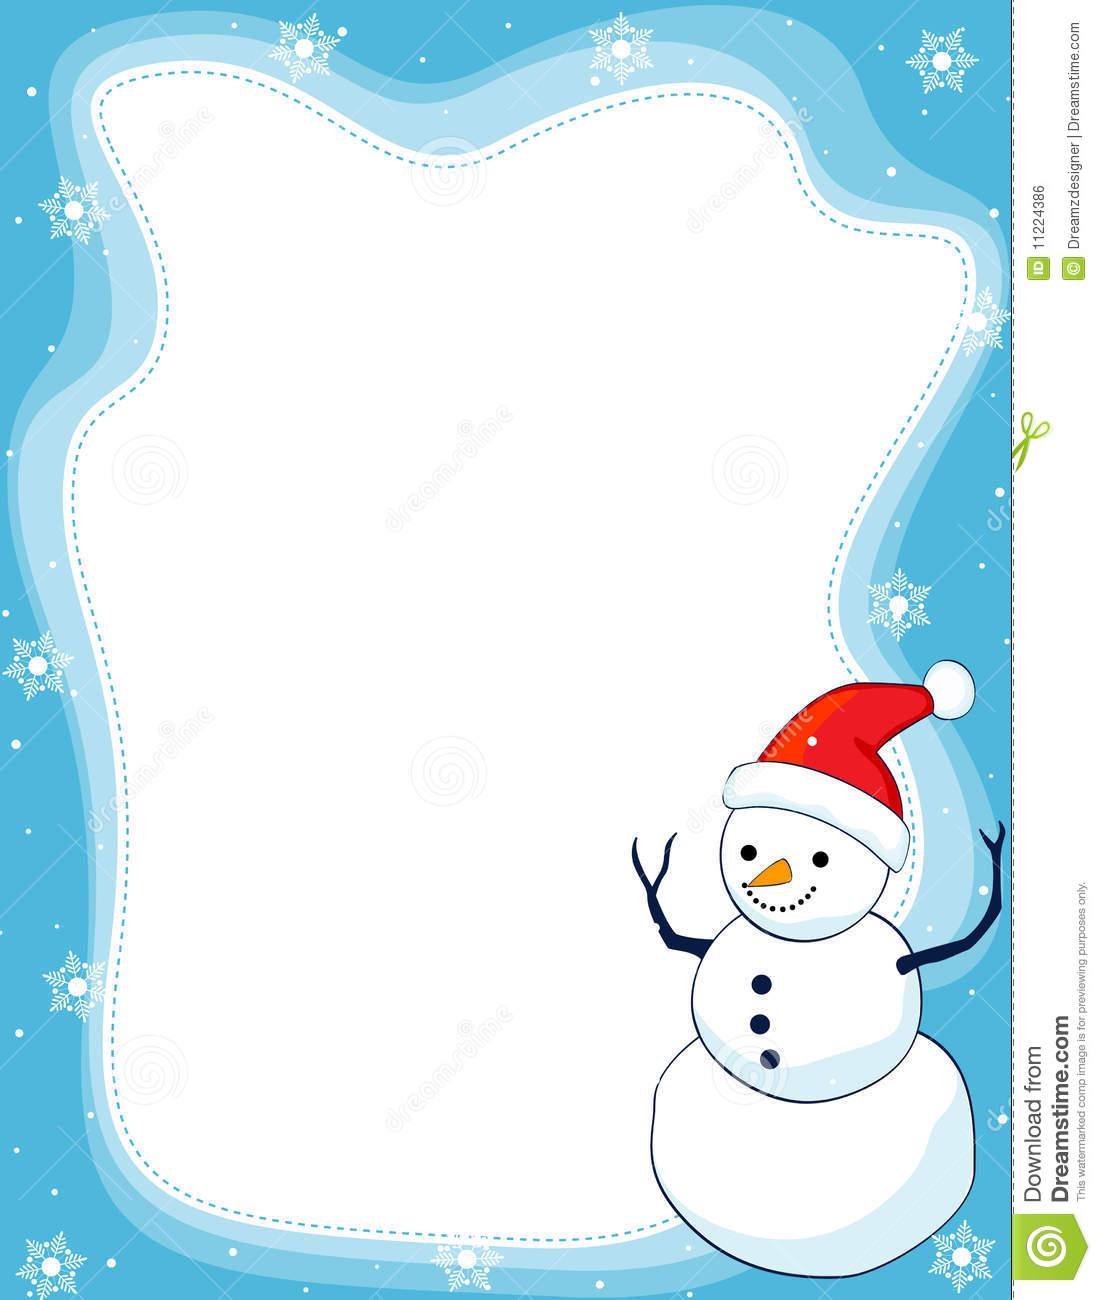 Snowman Clipart Border Clipground